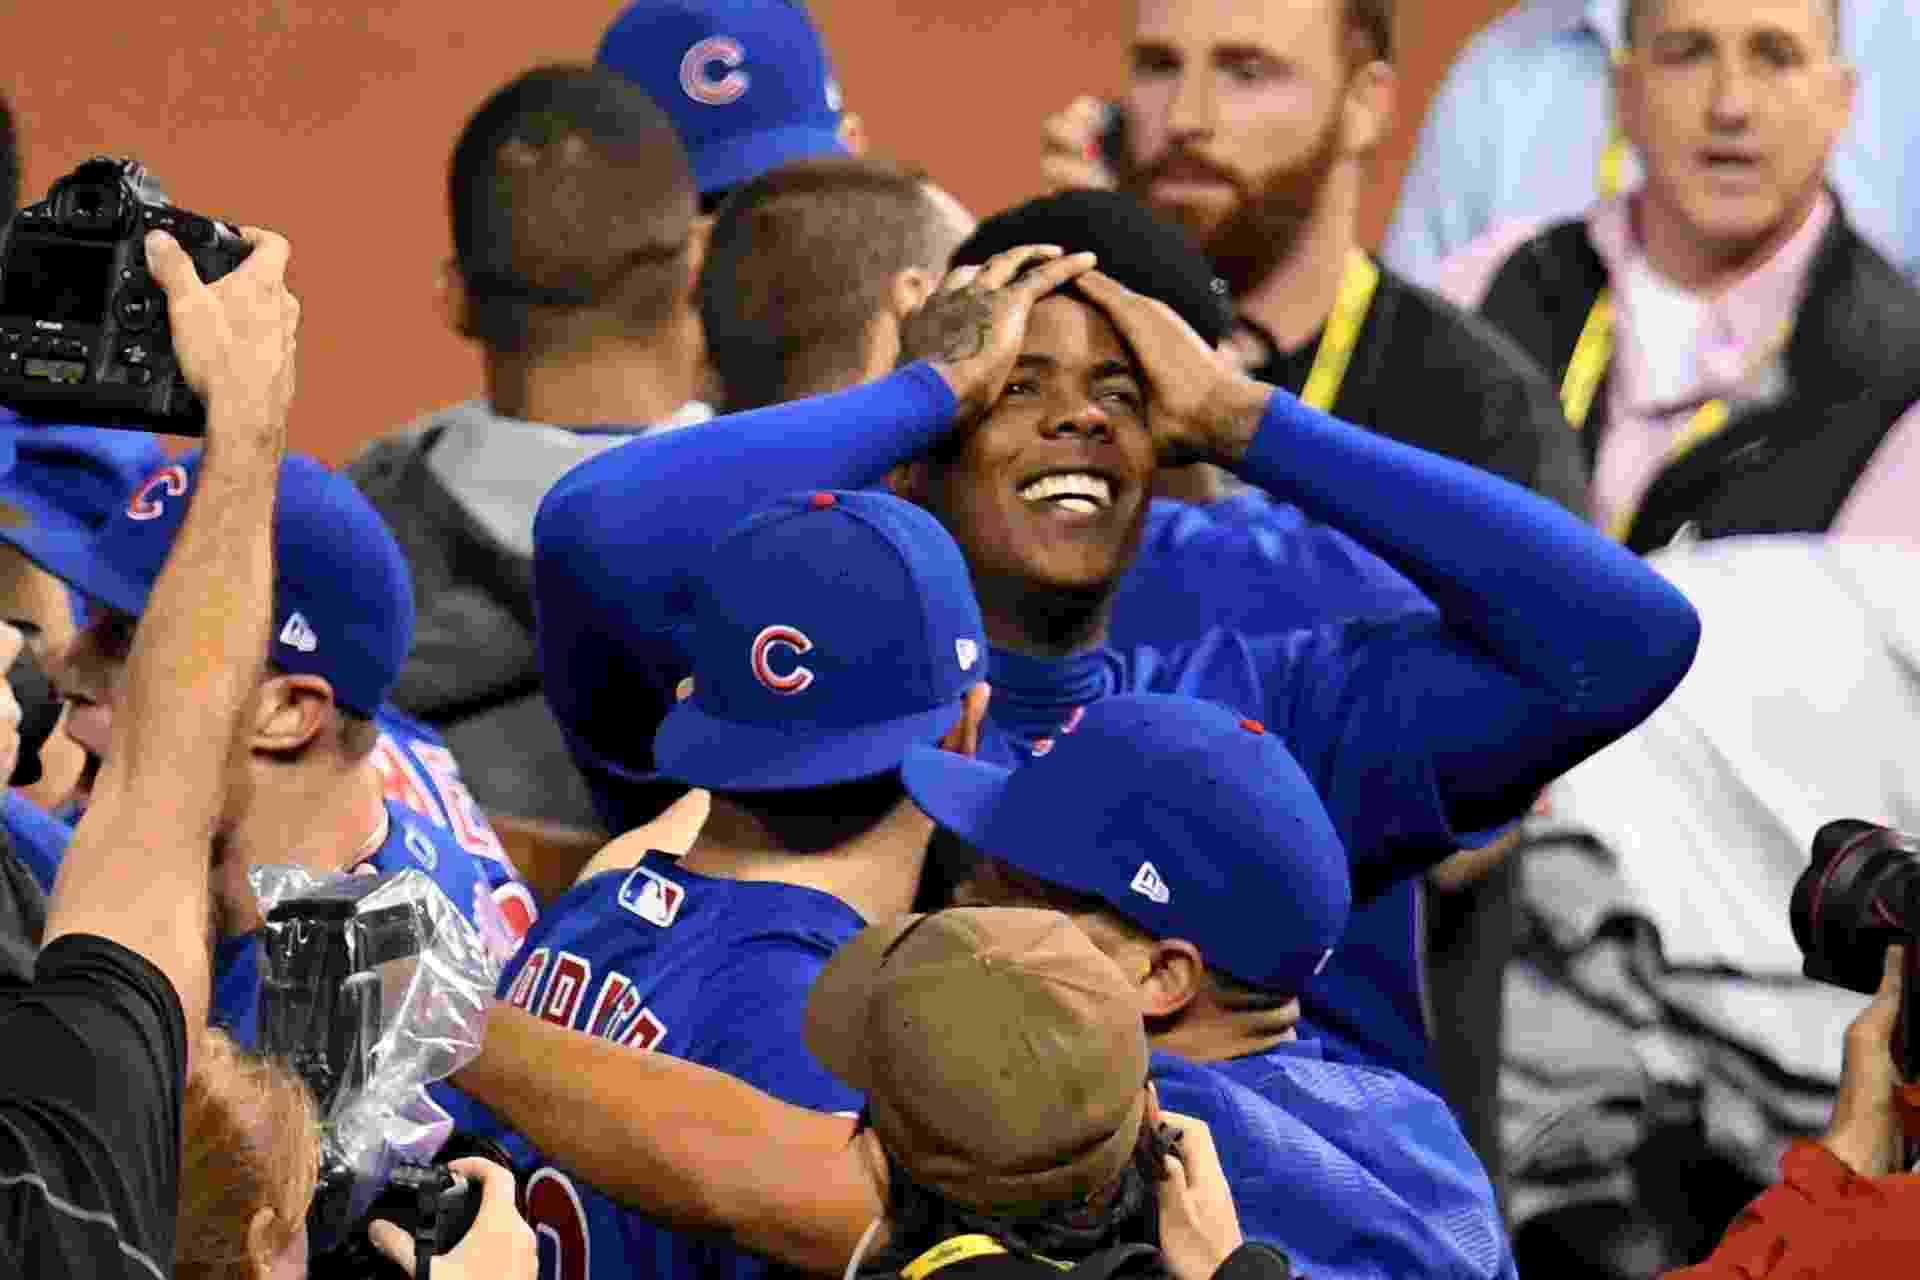 Aroldis Chapman comemora título da MLB do Chicago Cubs - Jason Miller/Getty Images/AFP